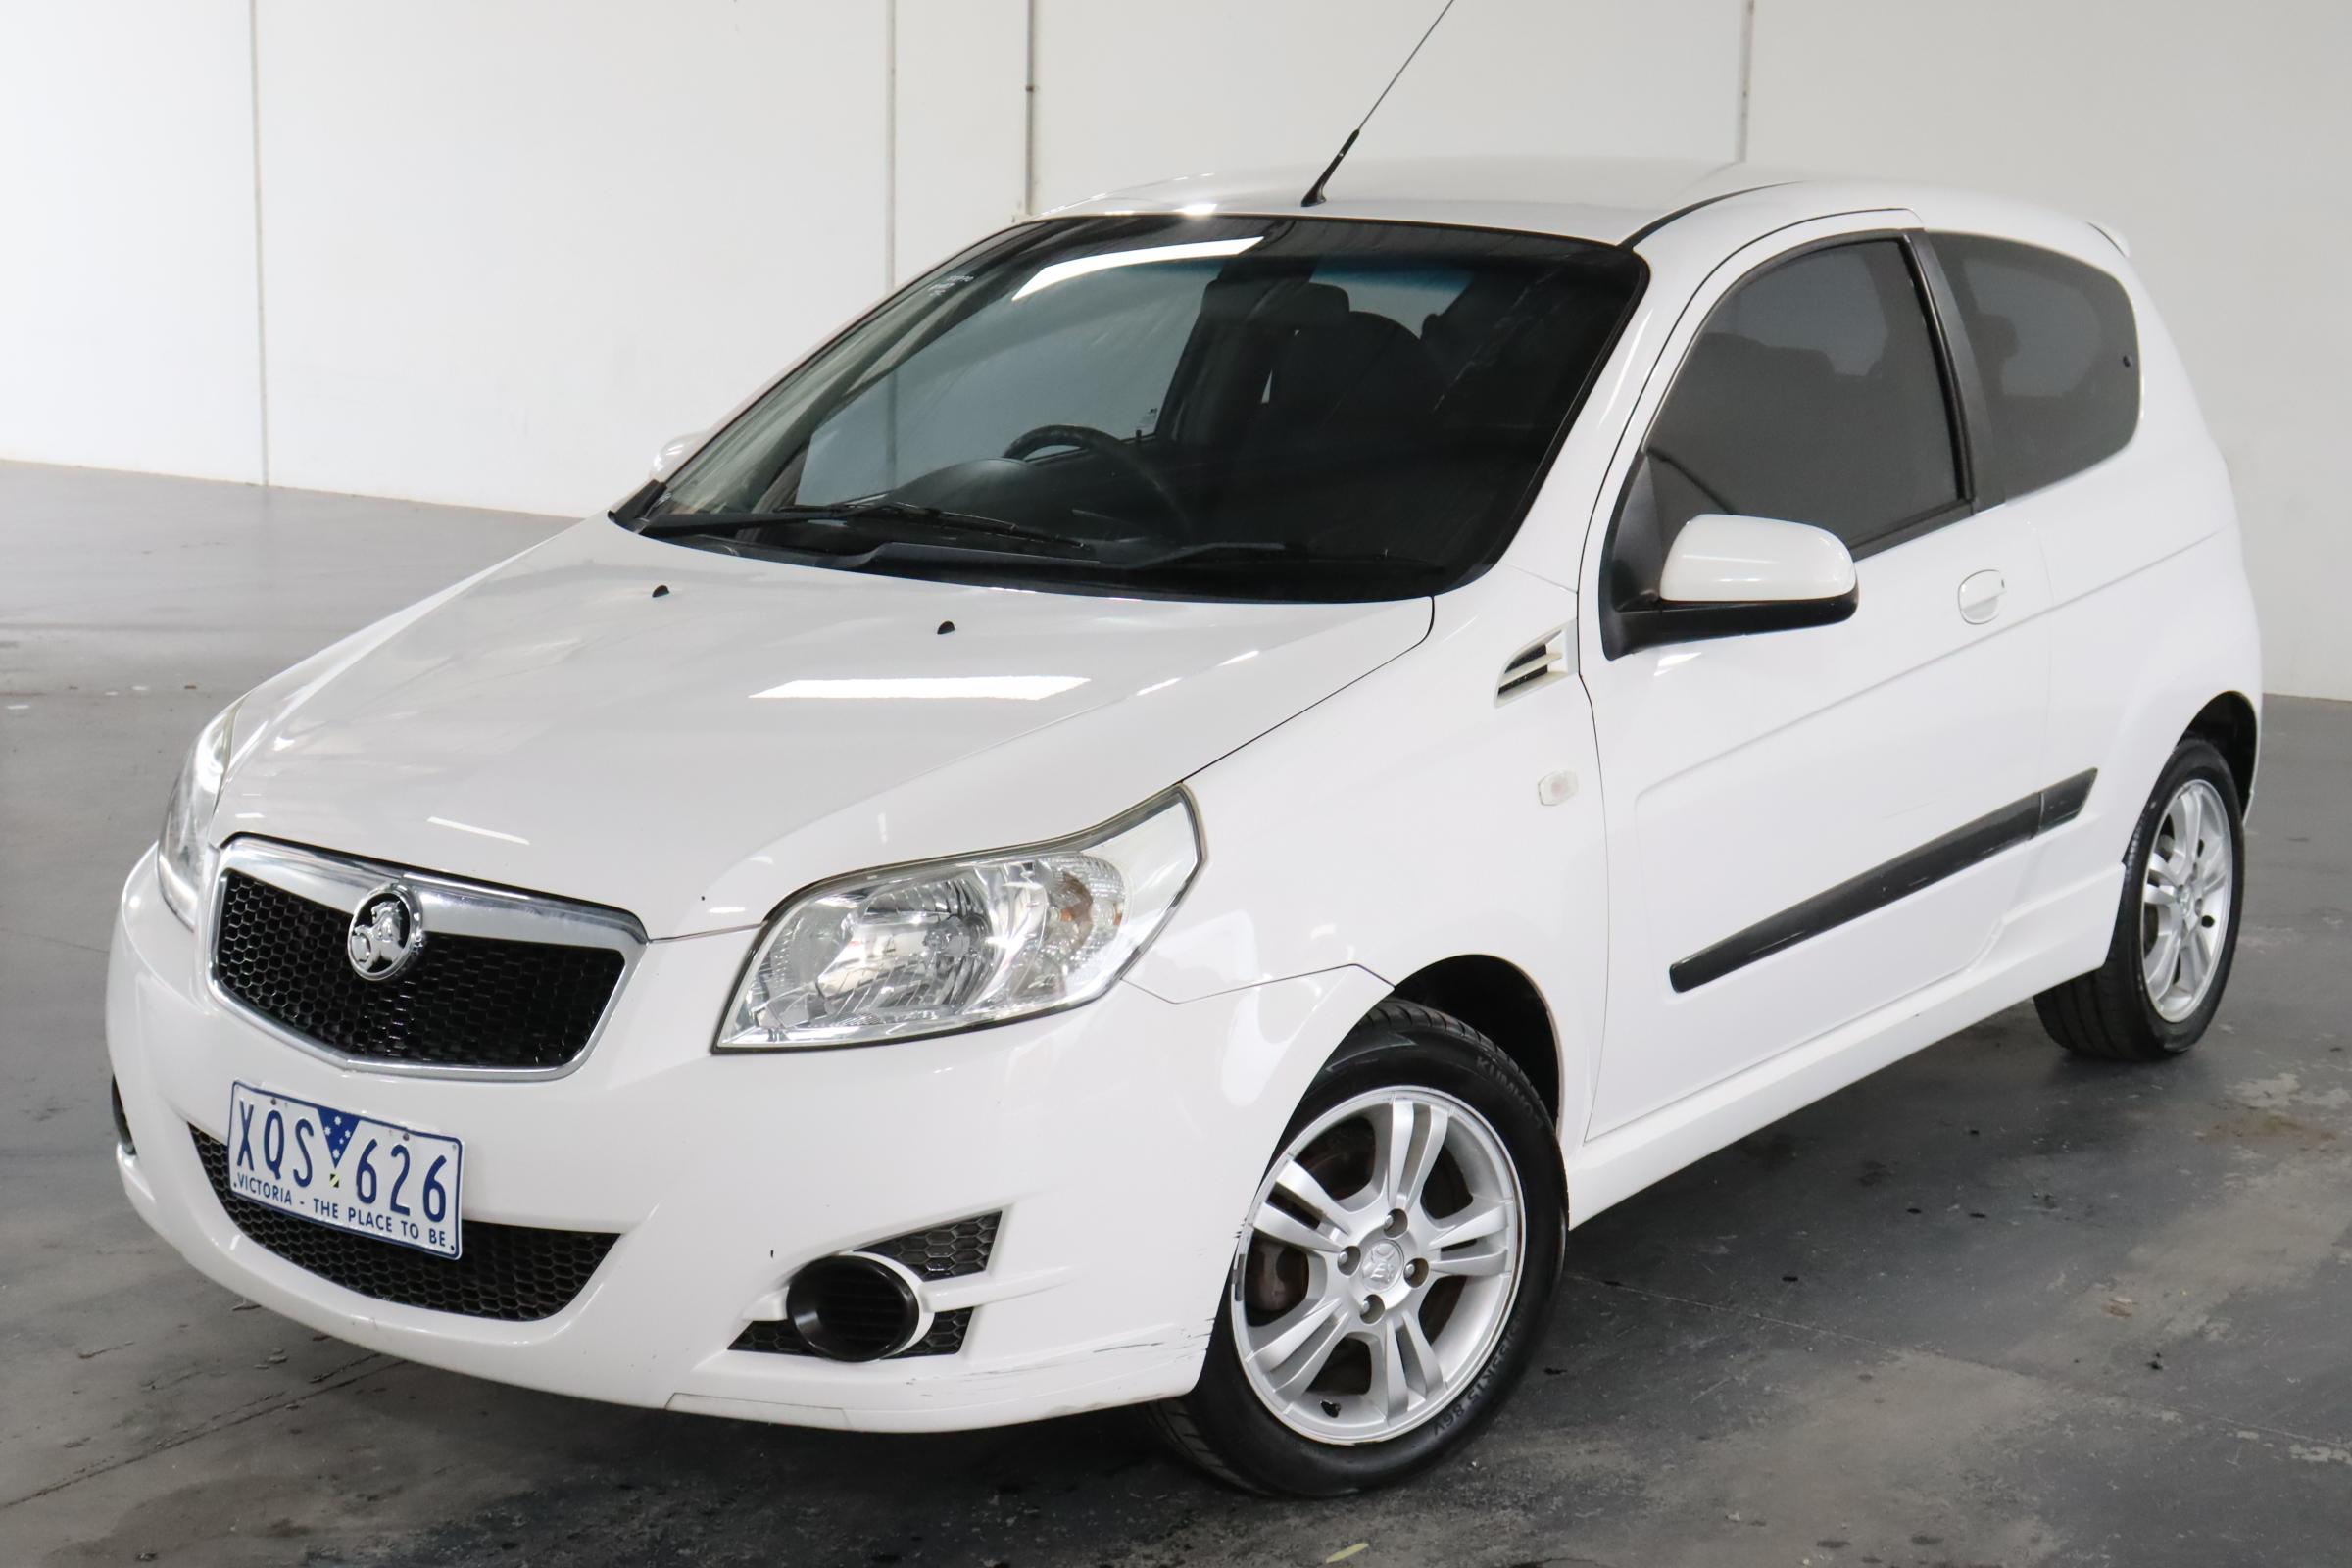 2010 Holden Barina TK Automatic Hatchback